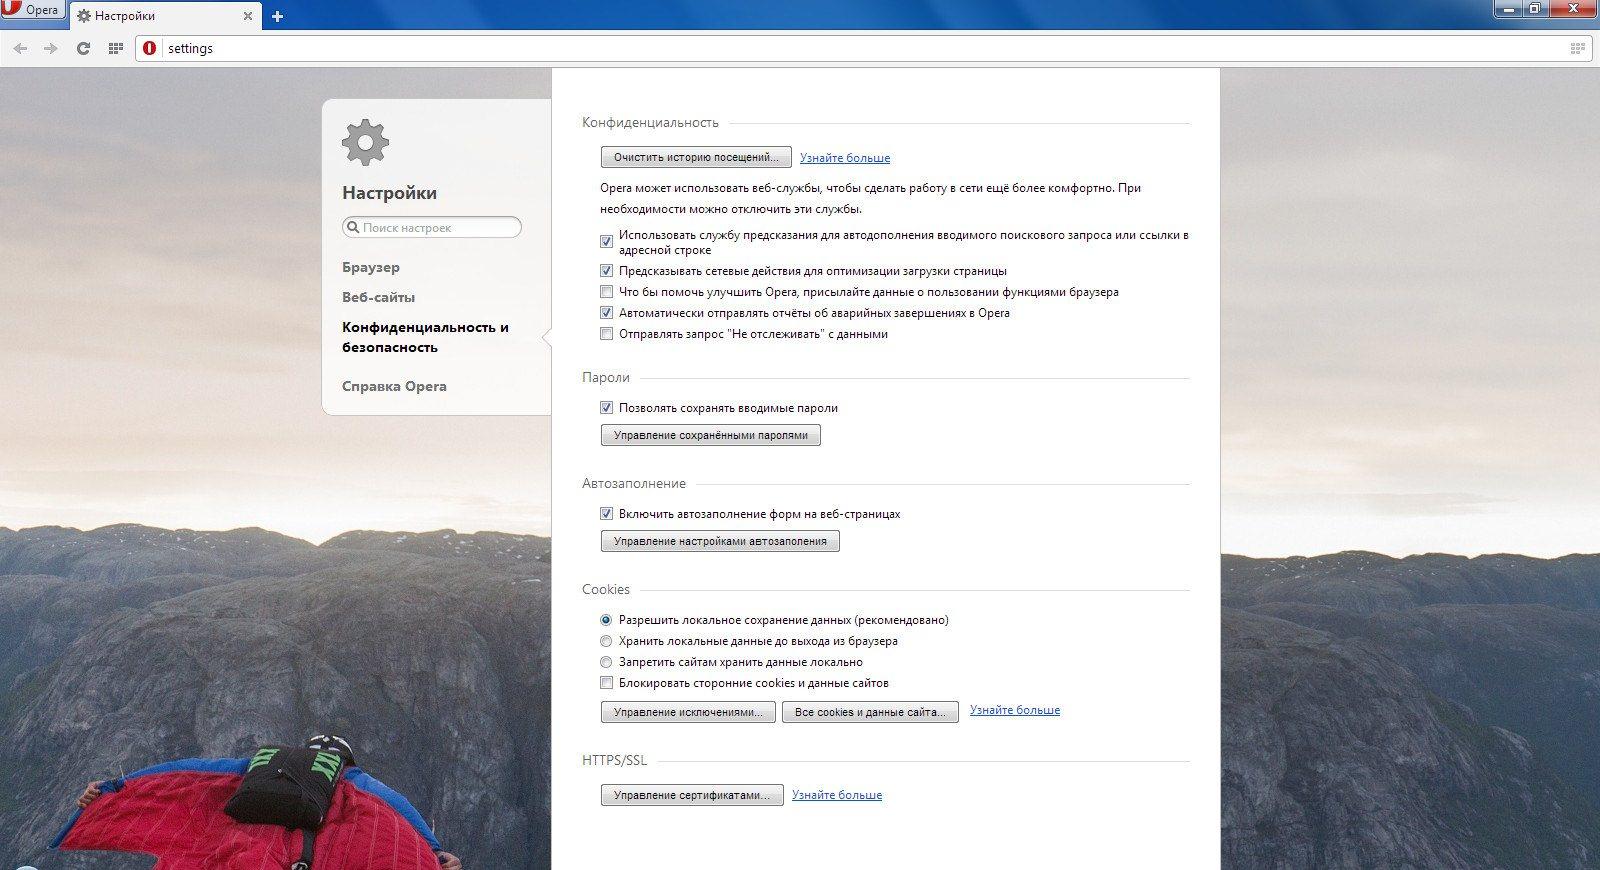 Opera 20.0.1387.91 Stable [Multi/Ru]